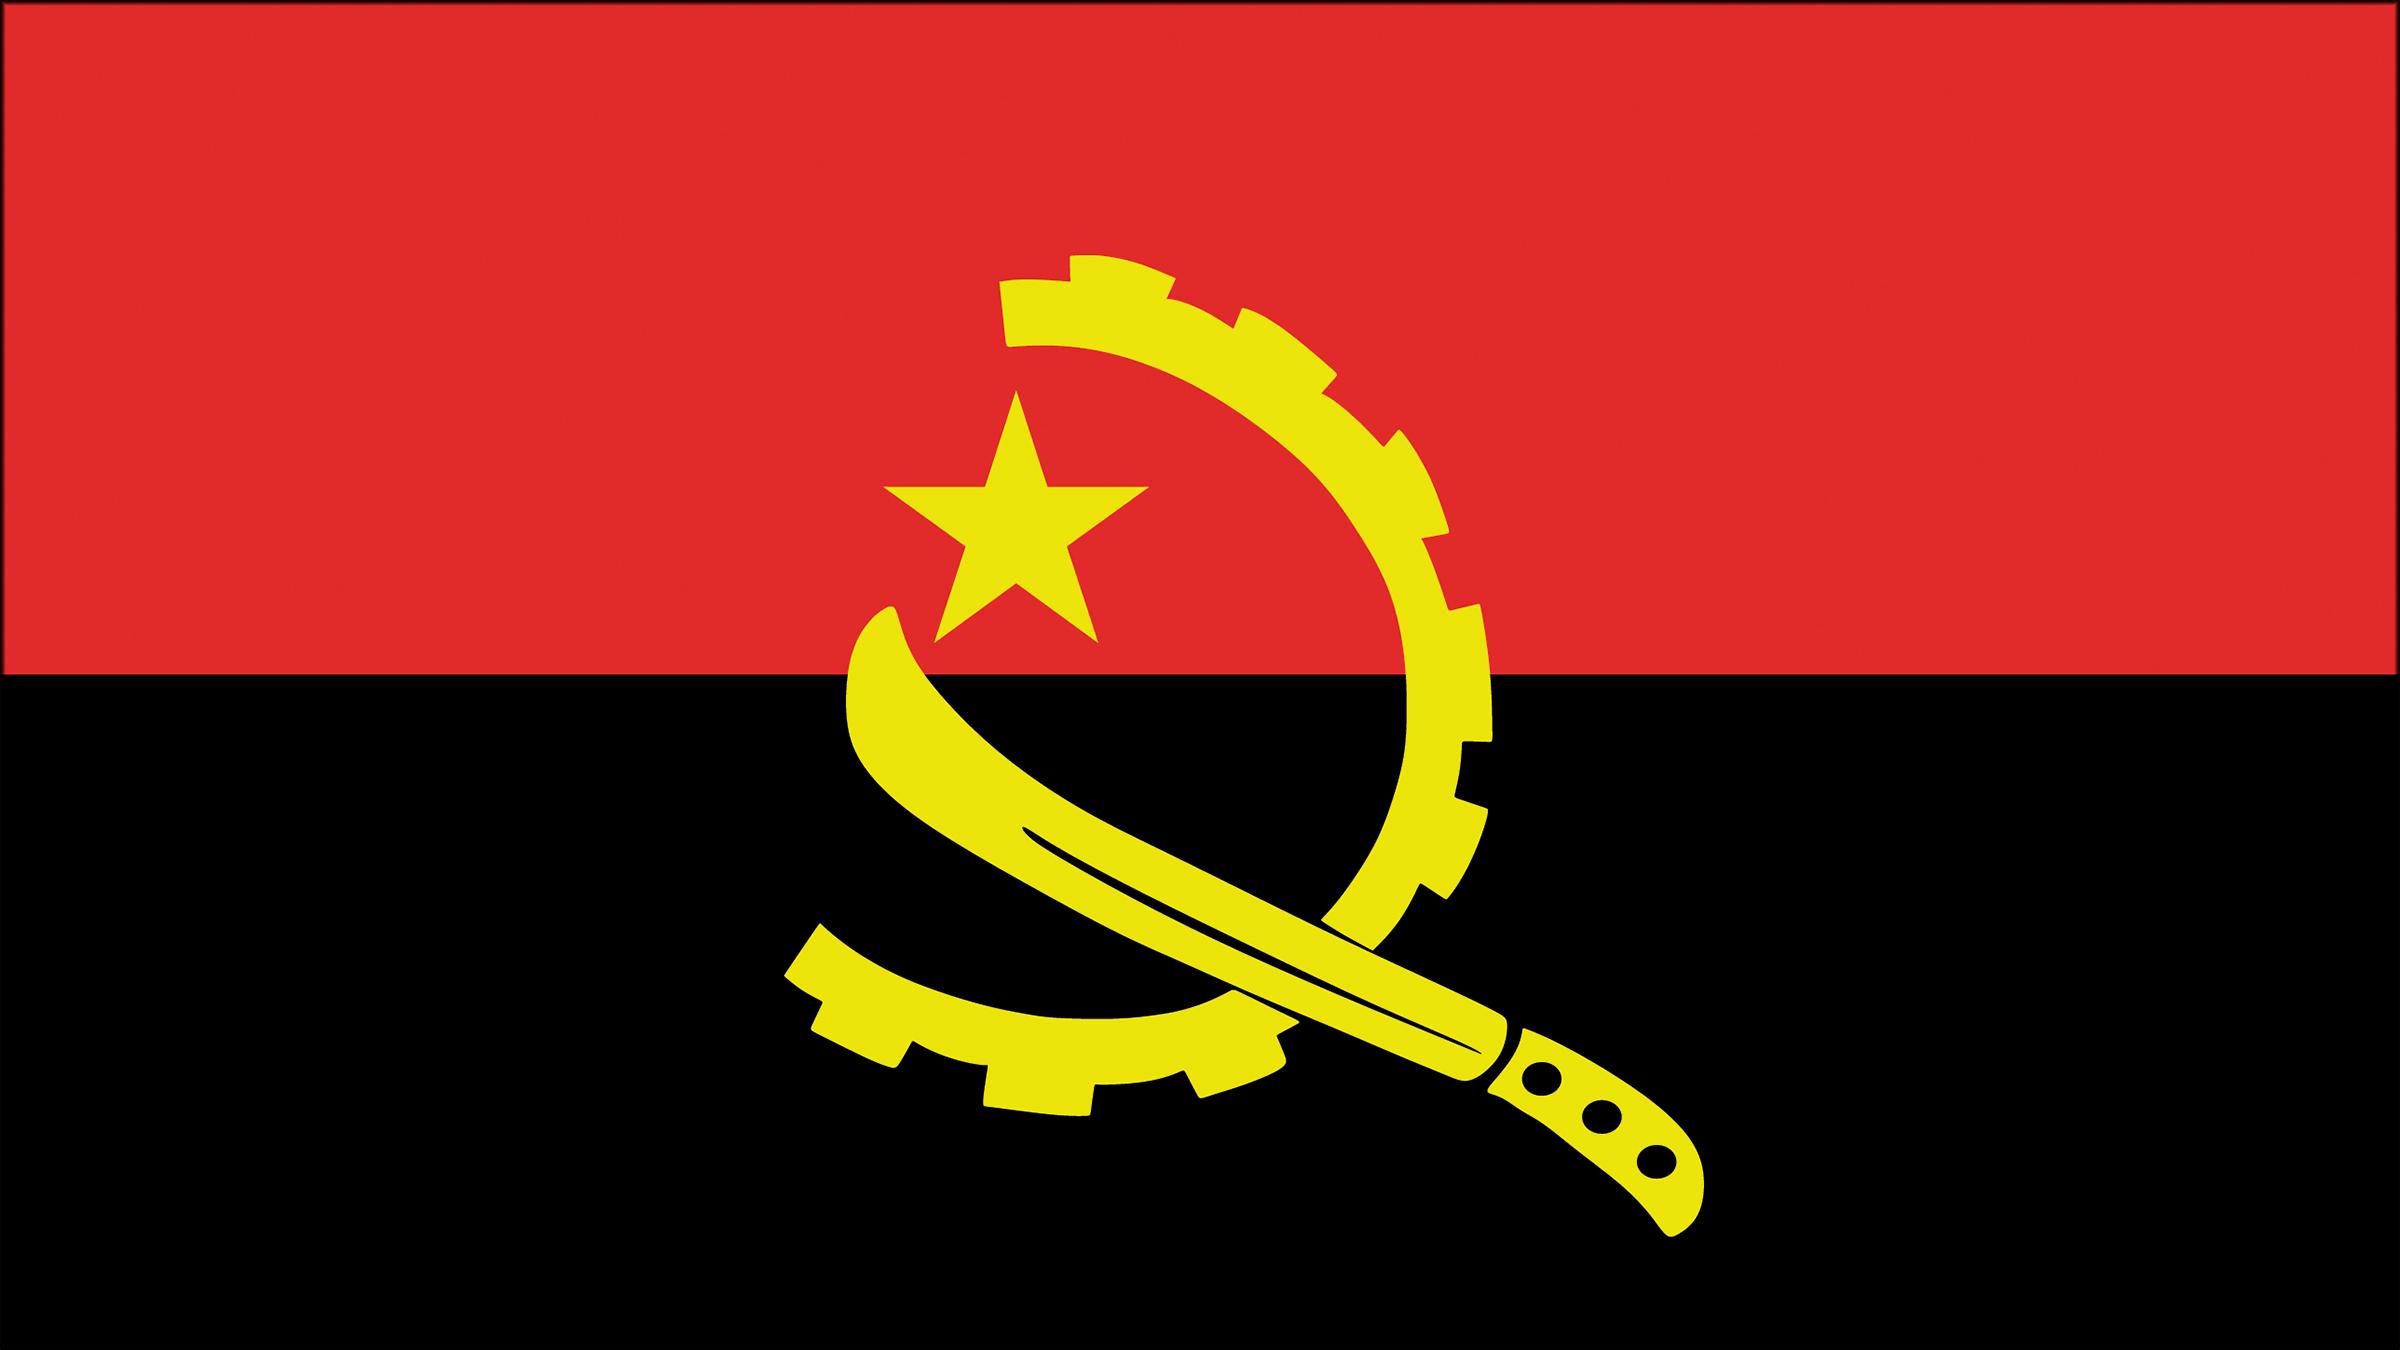 Bandera De Angola Banderas Africa Negra Escudo De Armas